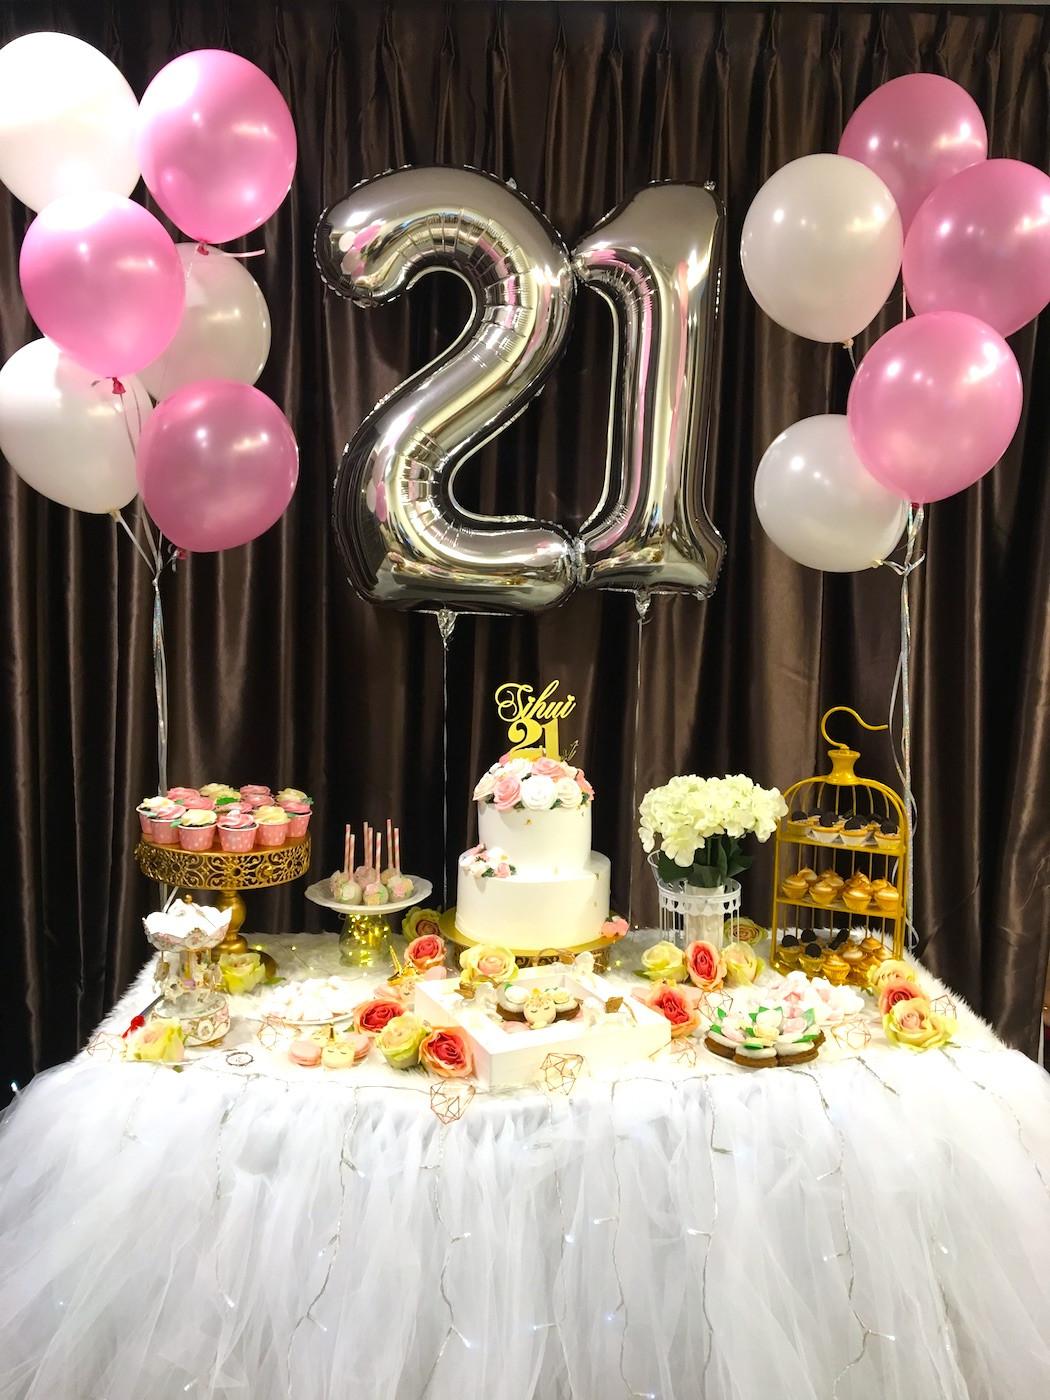 Decorations For 21st Birthday  21st Birthday Decoration